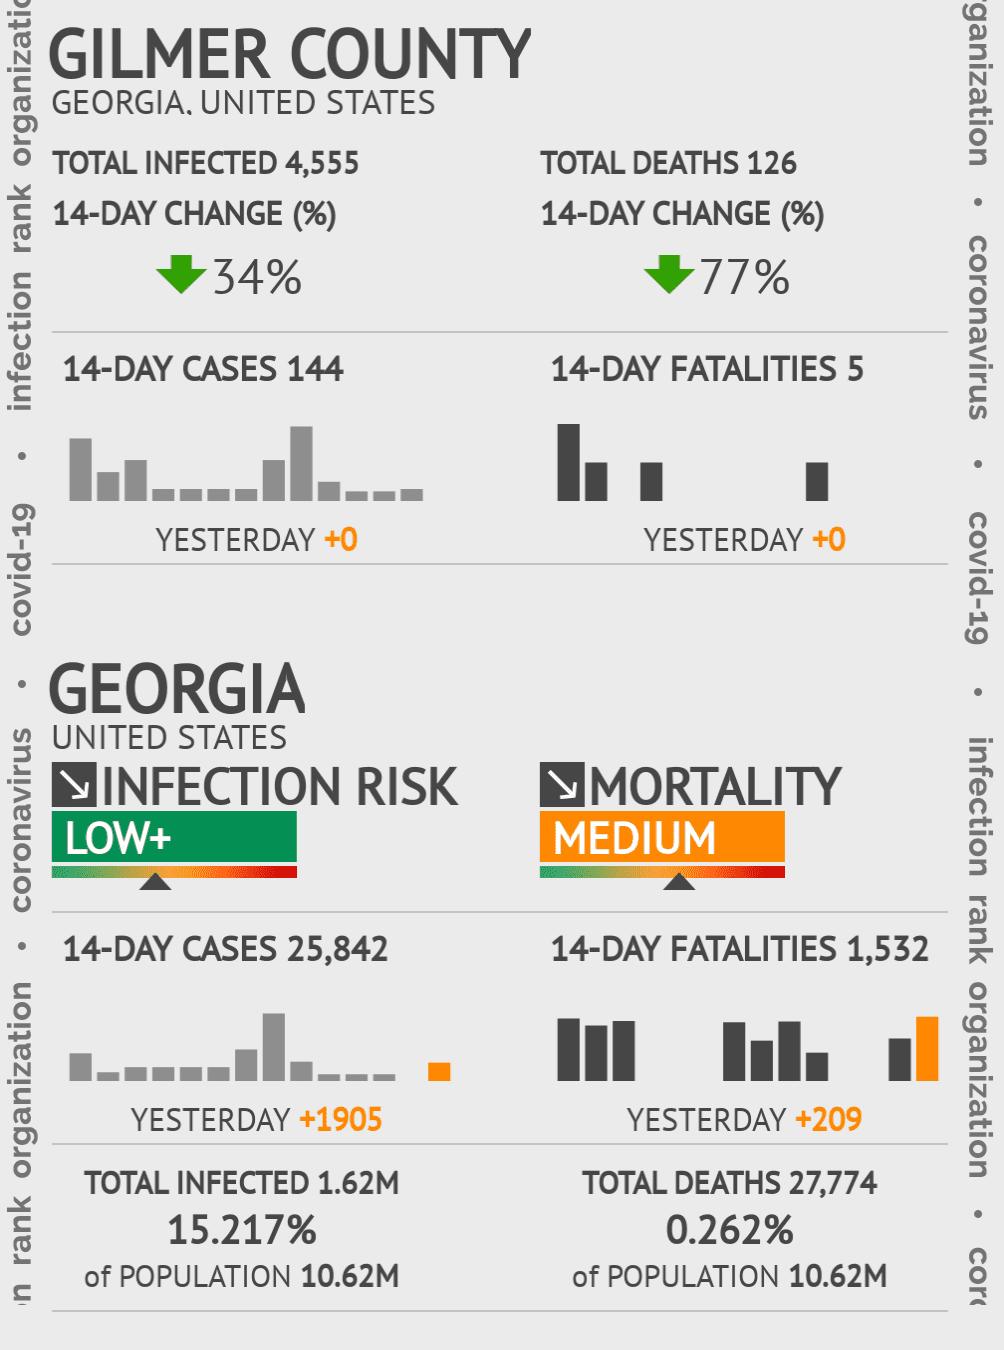 Gilmer County Coronavirus Covid-19 Risk of Infection on November 24, 2020